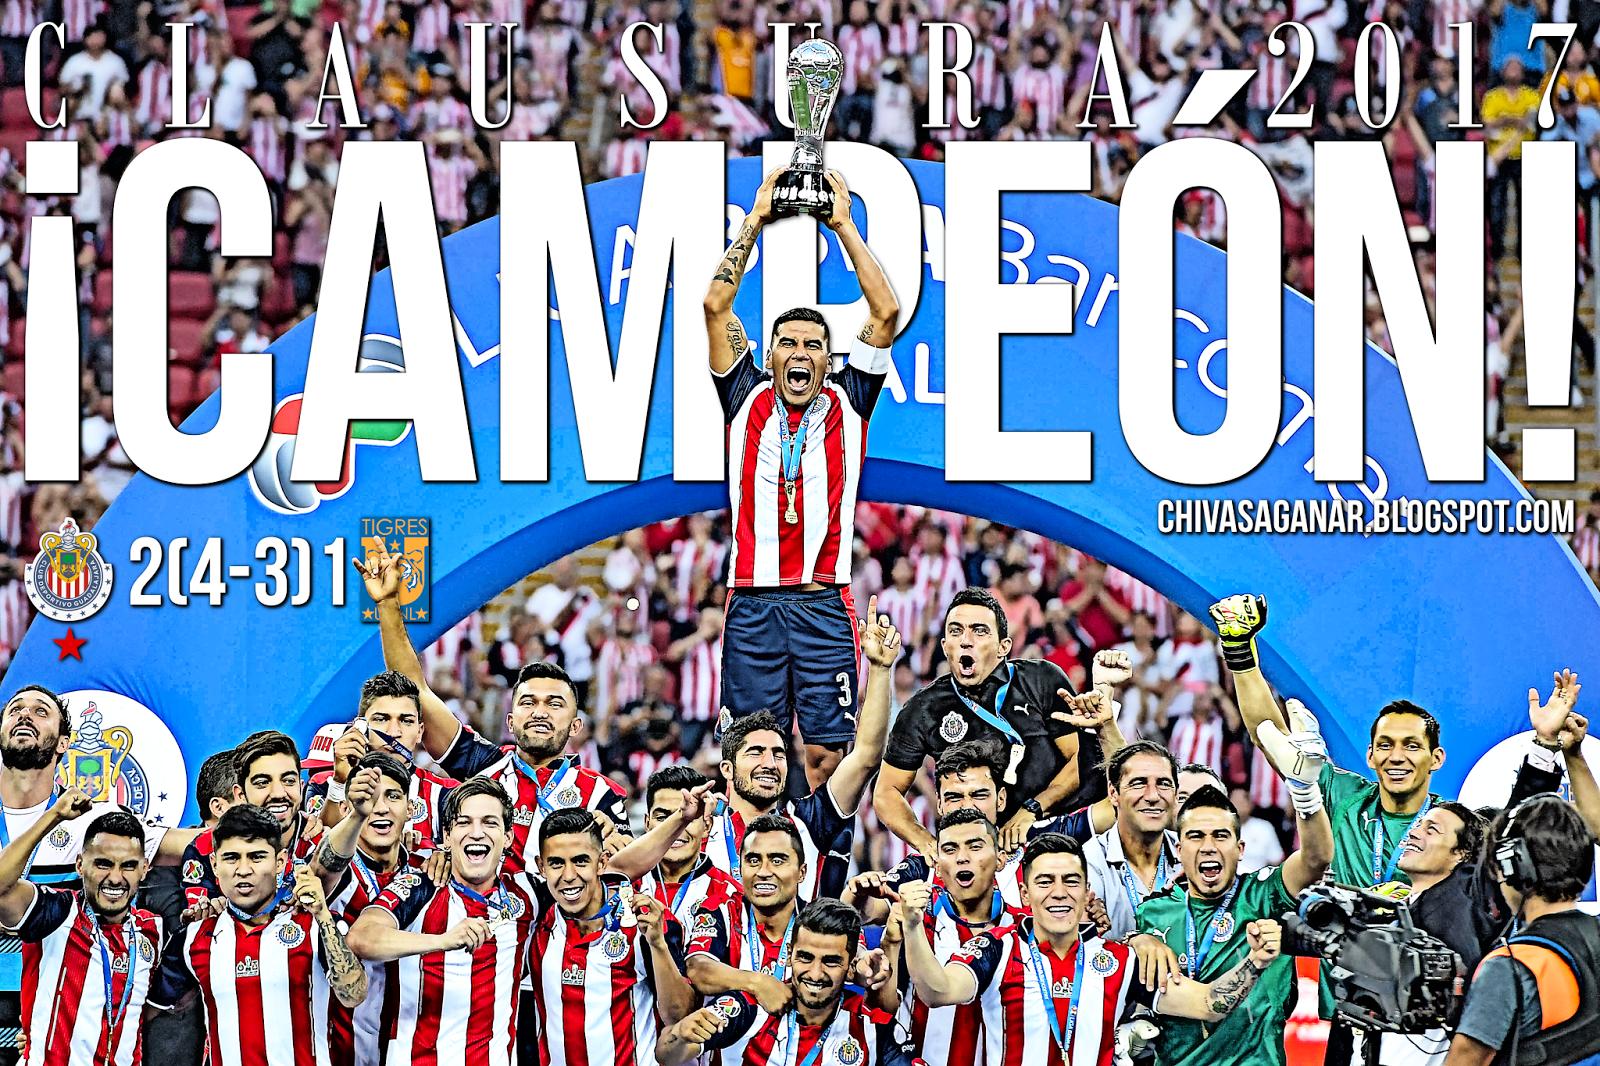 Liga MX : CD Guadalajara 2(4-3)1 CF Tigres UANL - Clausura 2017 - Final/Vuelta.